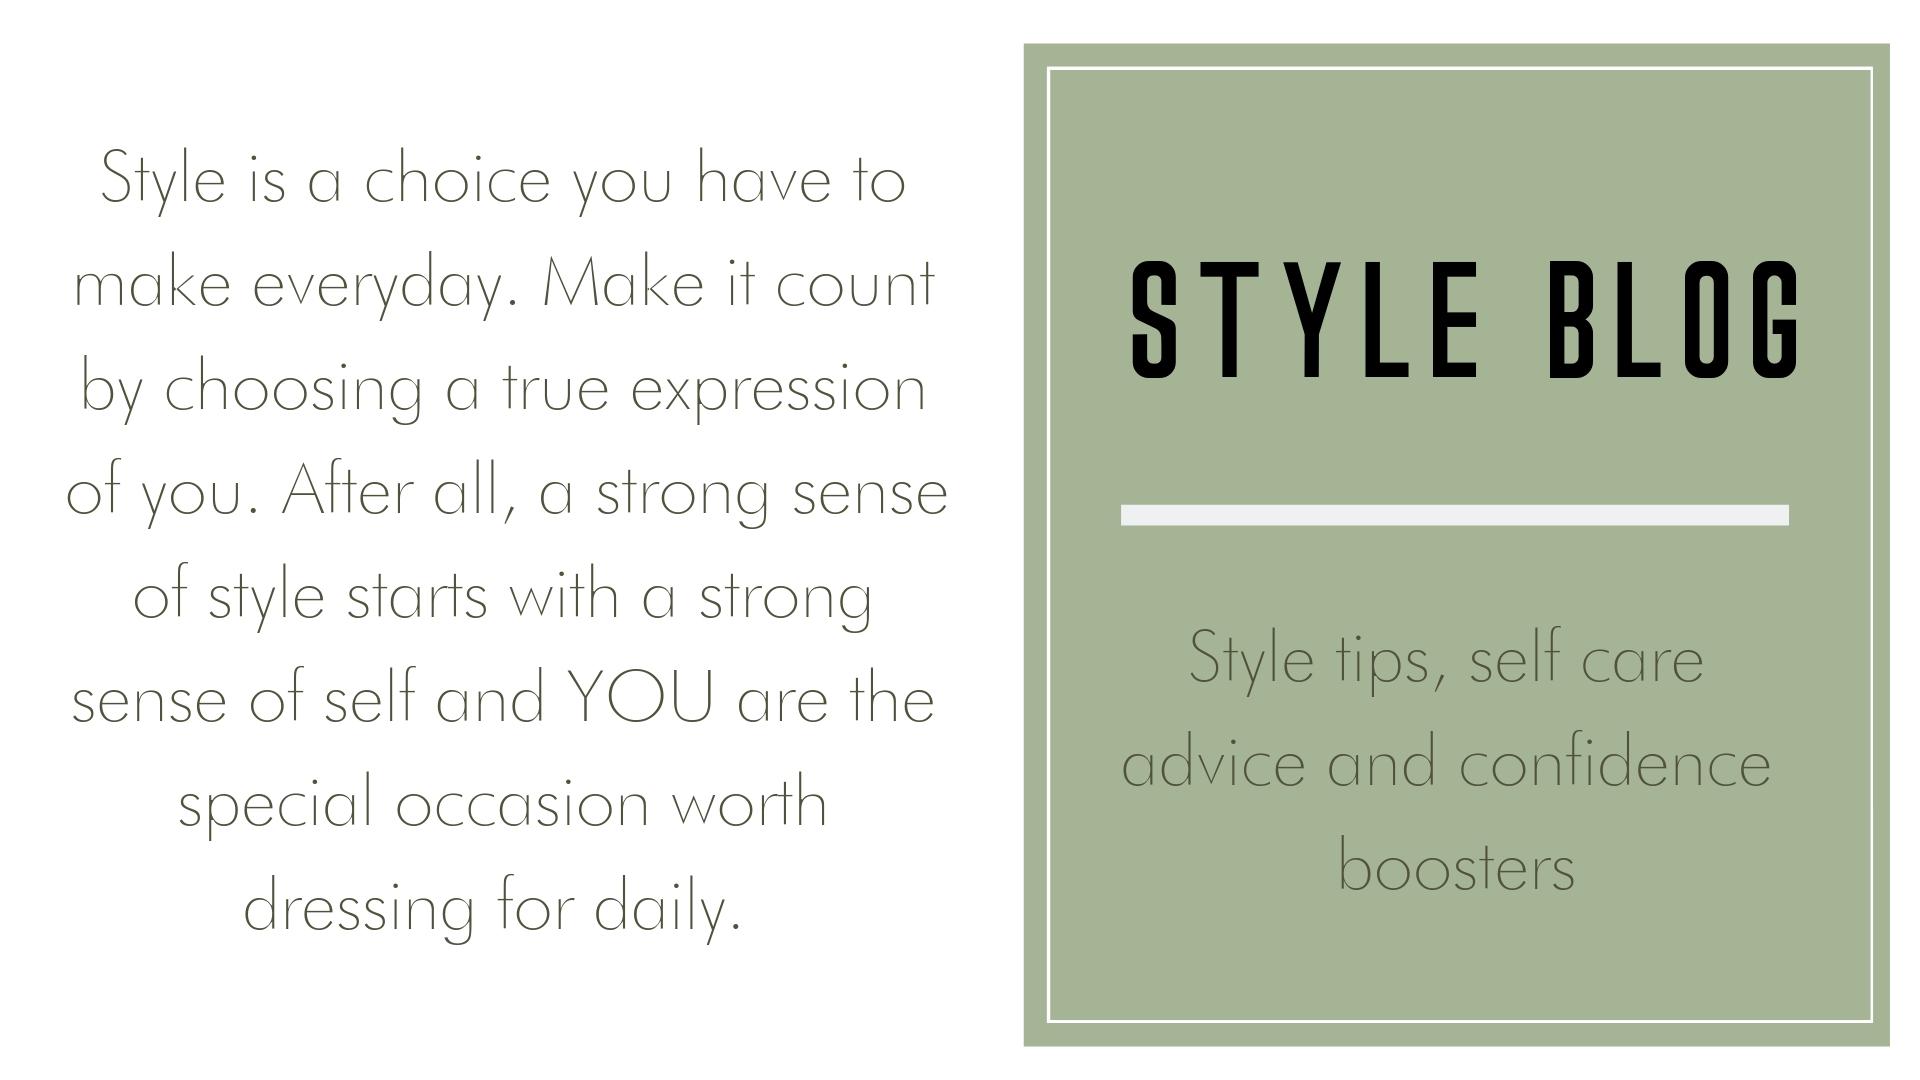 styleblurb (1).jpg